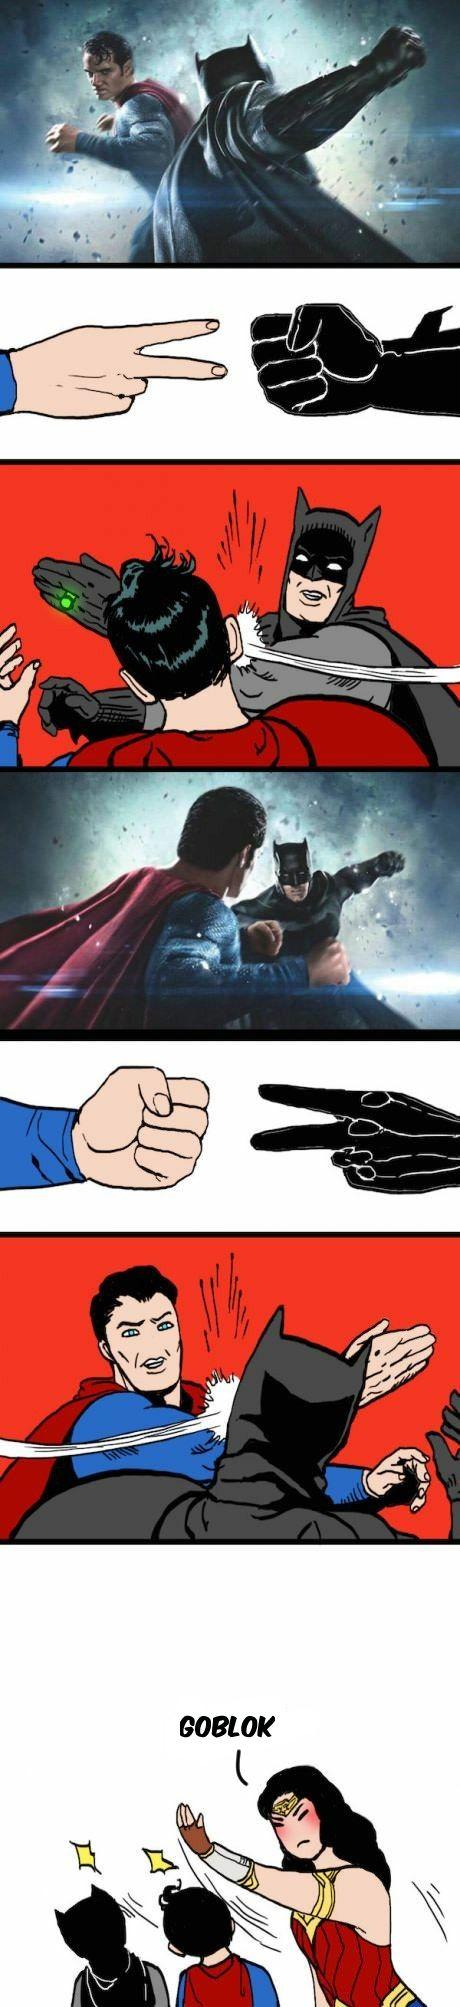 Komik Koplak Batman v Superman Komik, Batman vs superman